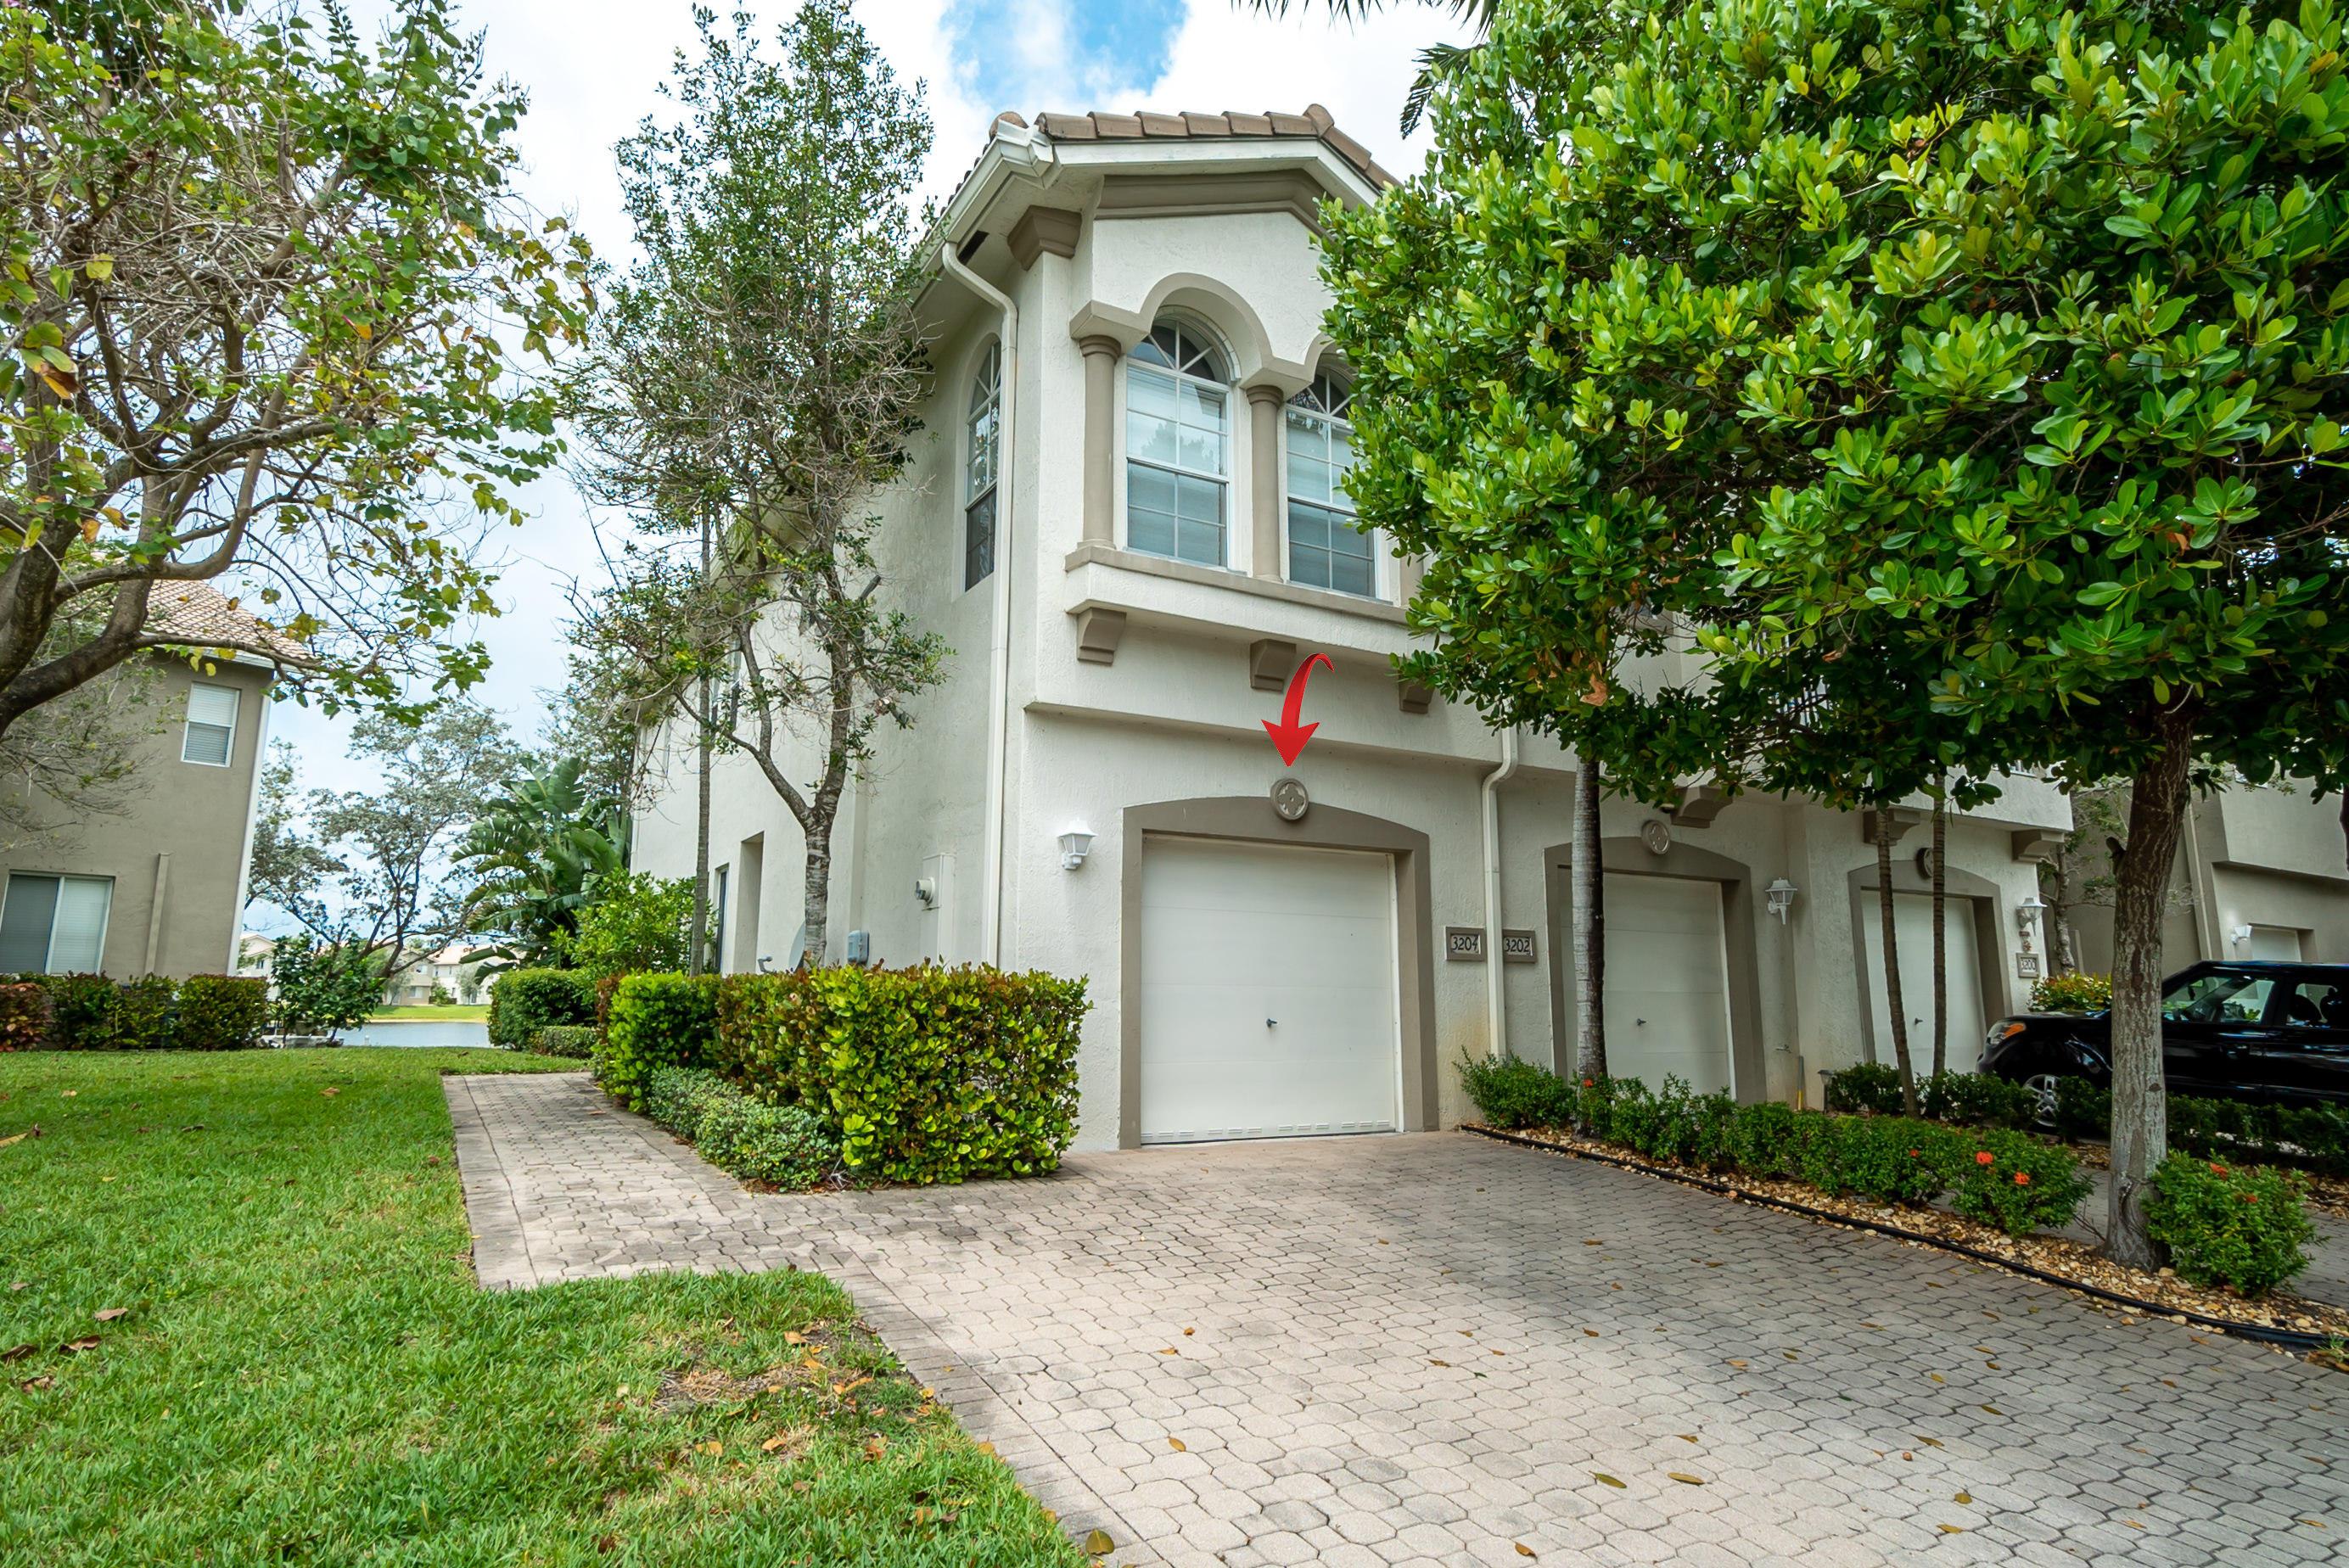 3204 Laurel Ridge Circle, Riviera Beach, Florida 33404, 3 Bedrooms Bedrooms, ,2.1 BathroomsBathrooms,A,Townhouse,Laurel Ridge,RX-10617146